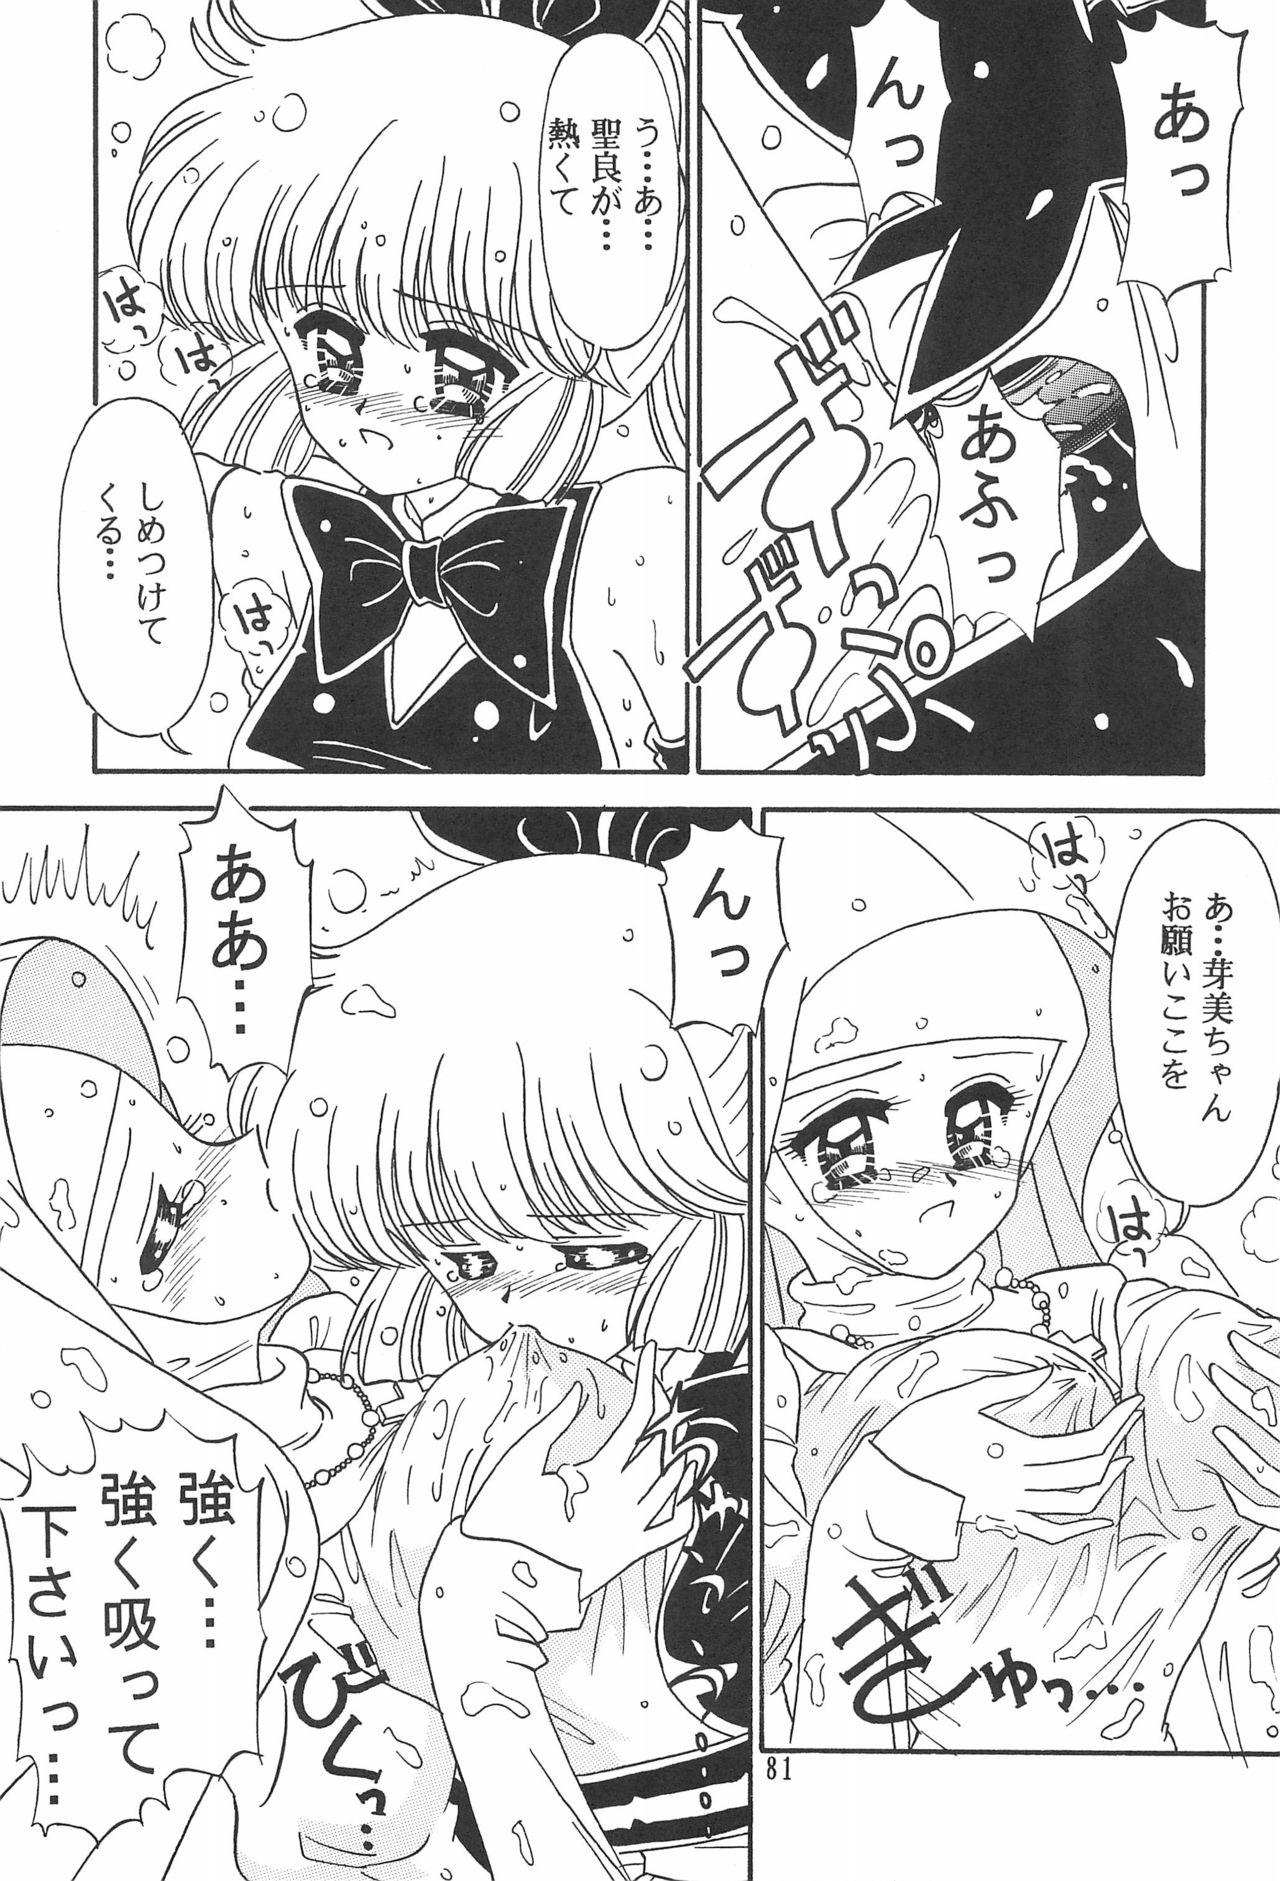 Showbaku 82